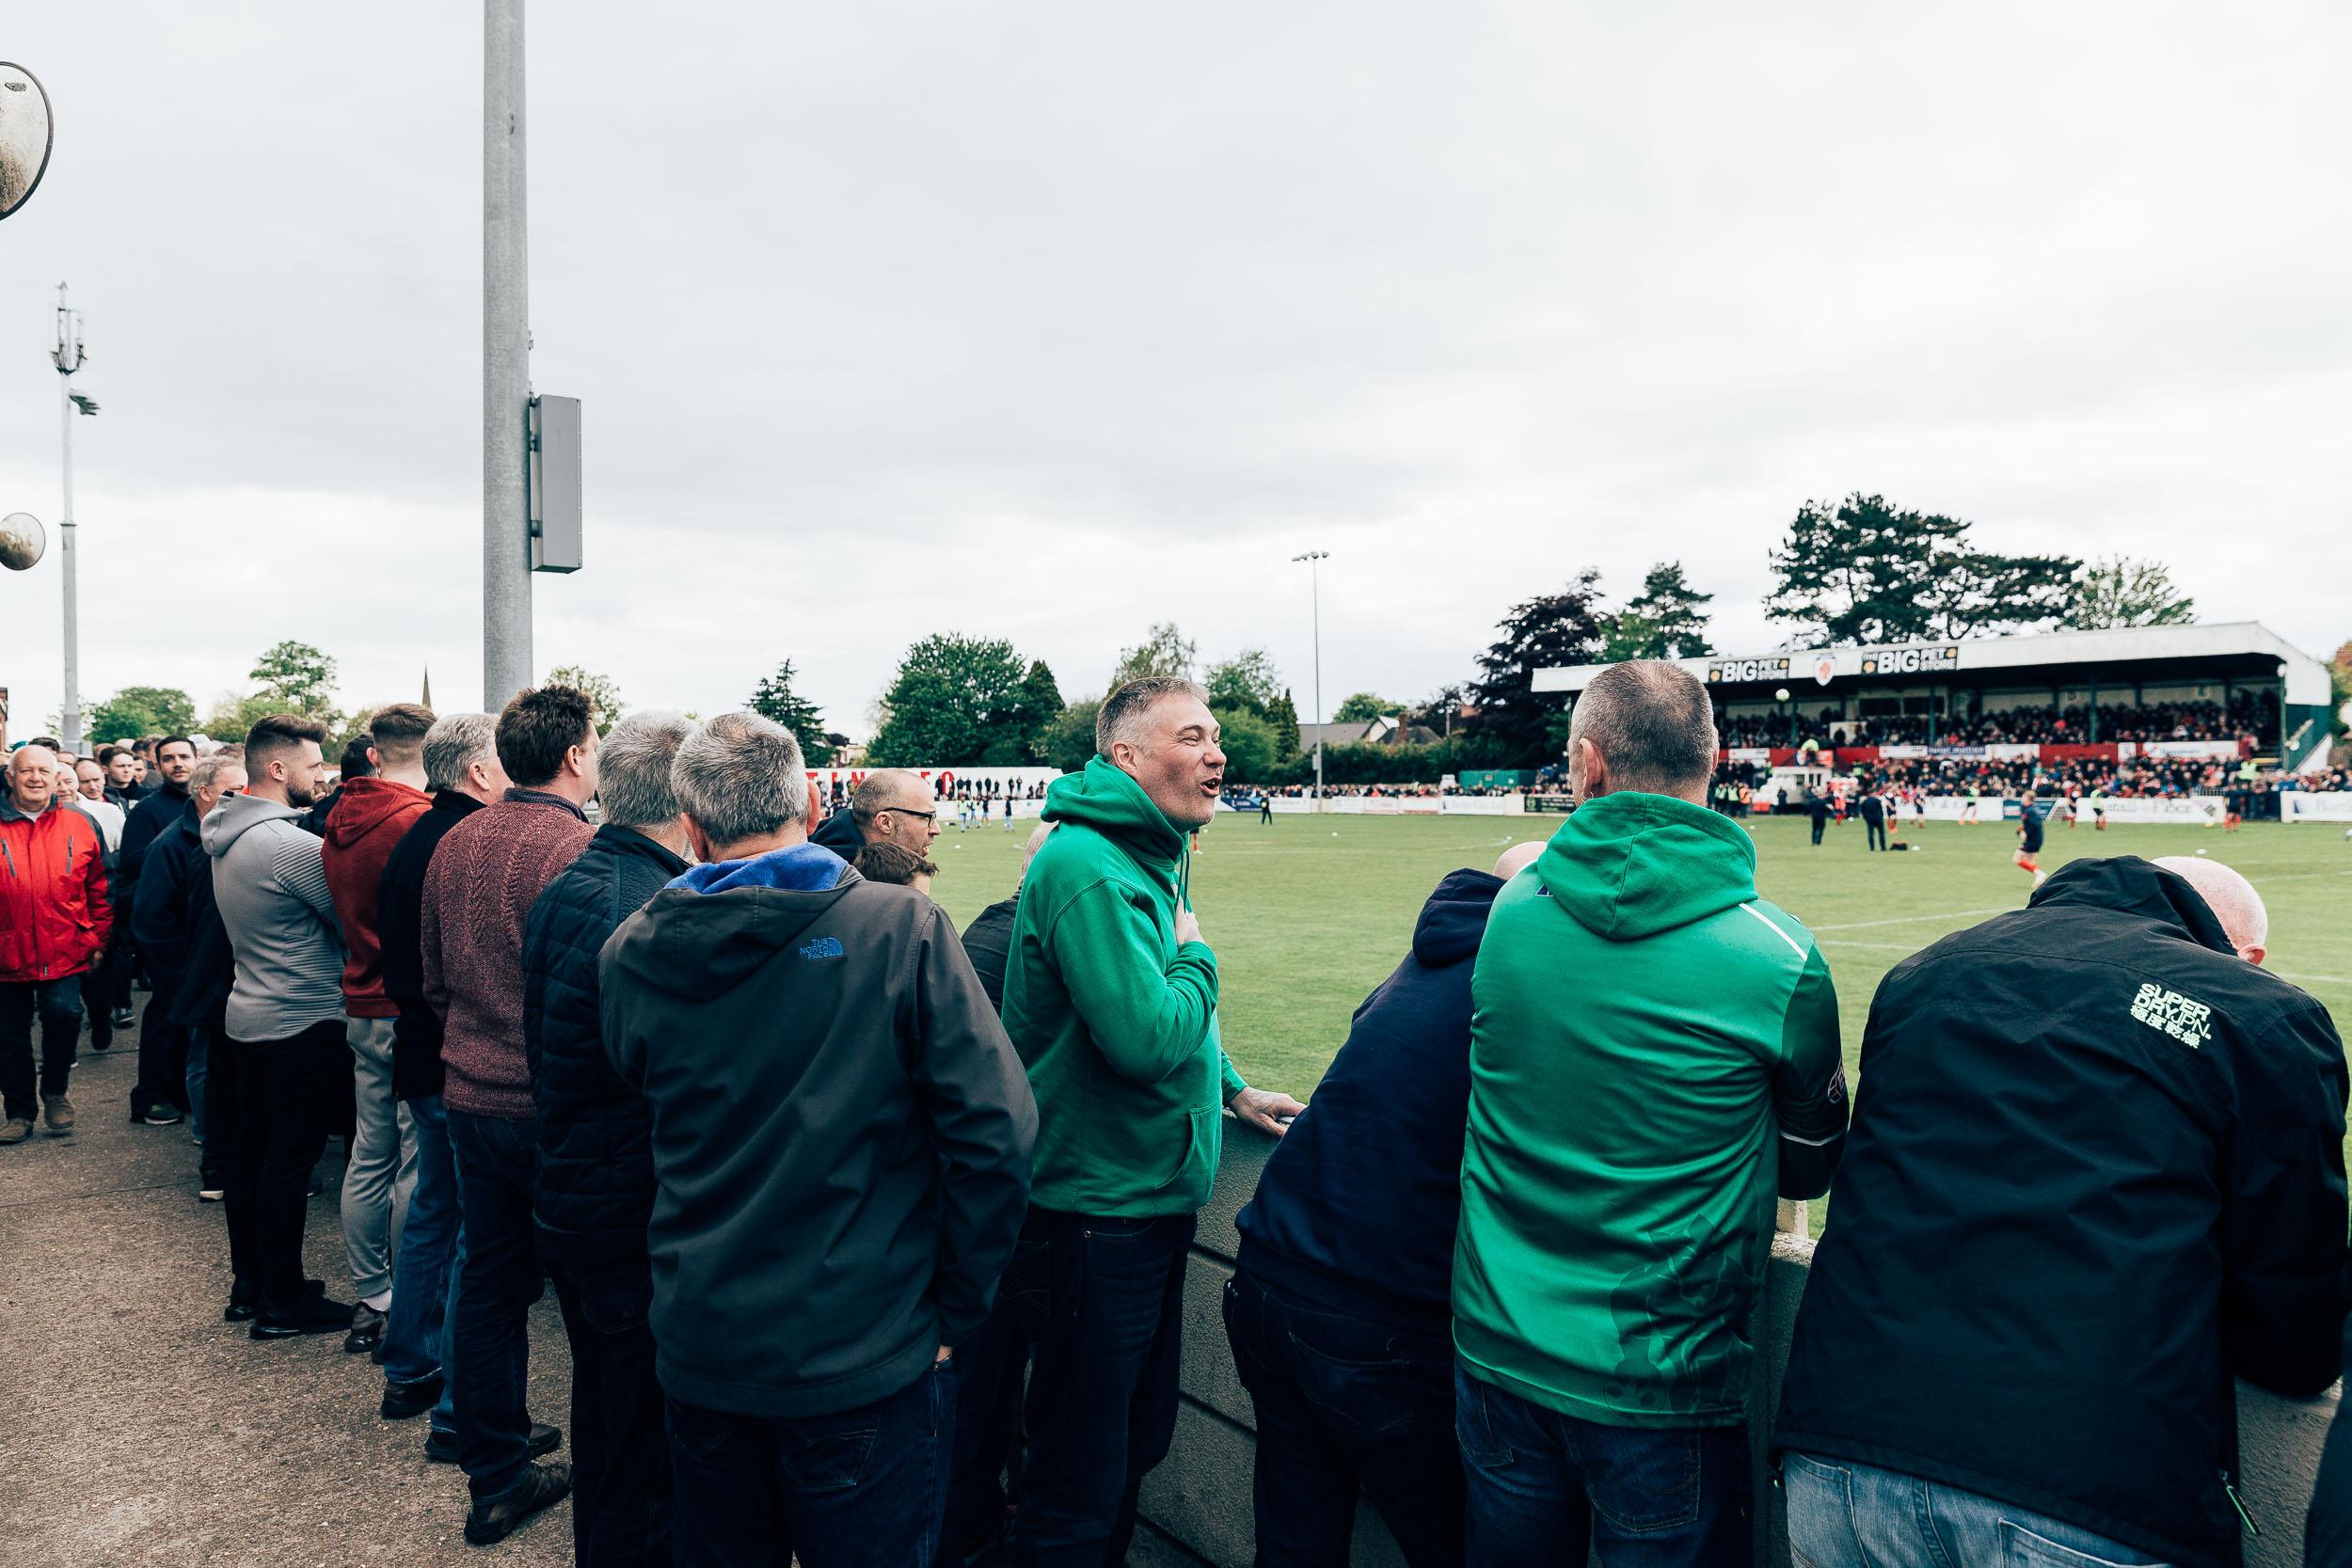 06_05_2019_Bromsgrove_Sporting_Corby-44.jpg